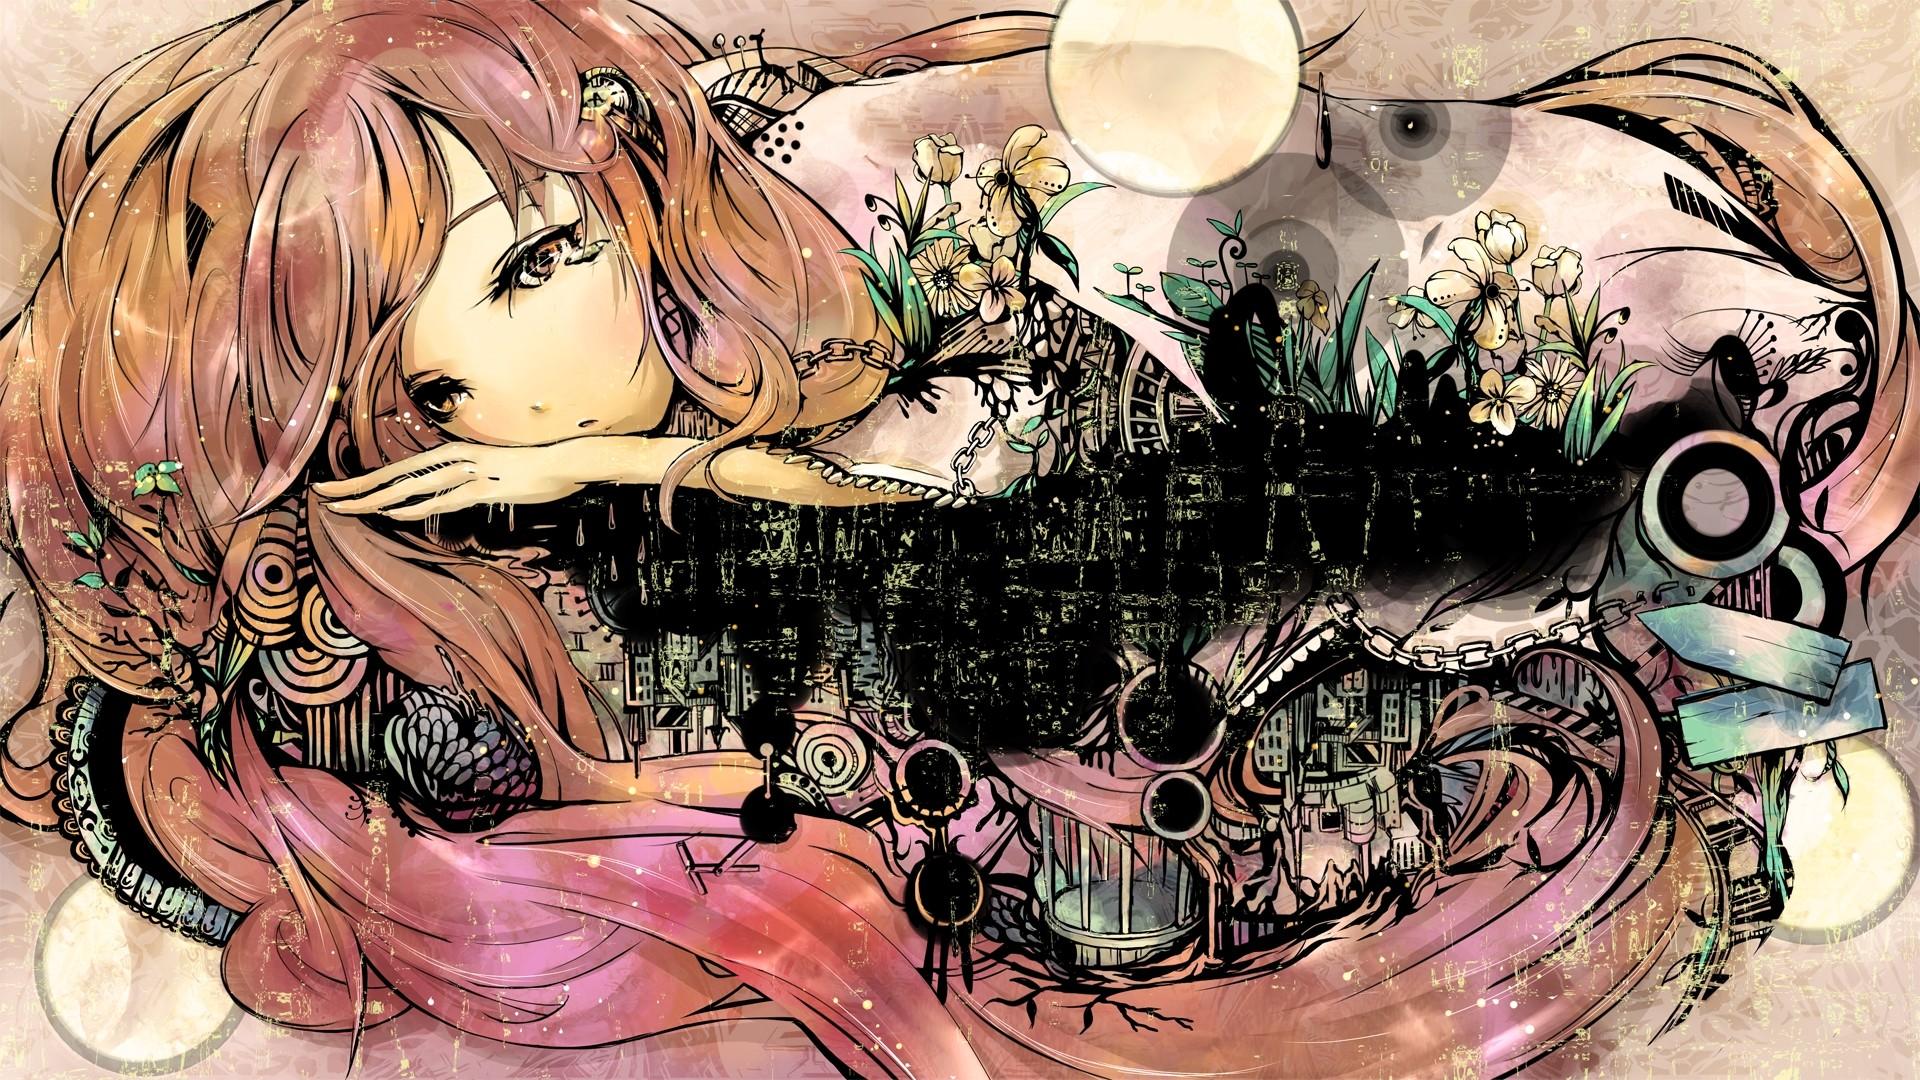 Anime Fanart Background Wallpaper